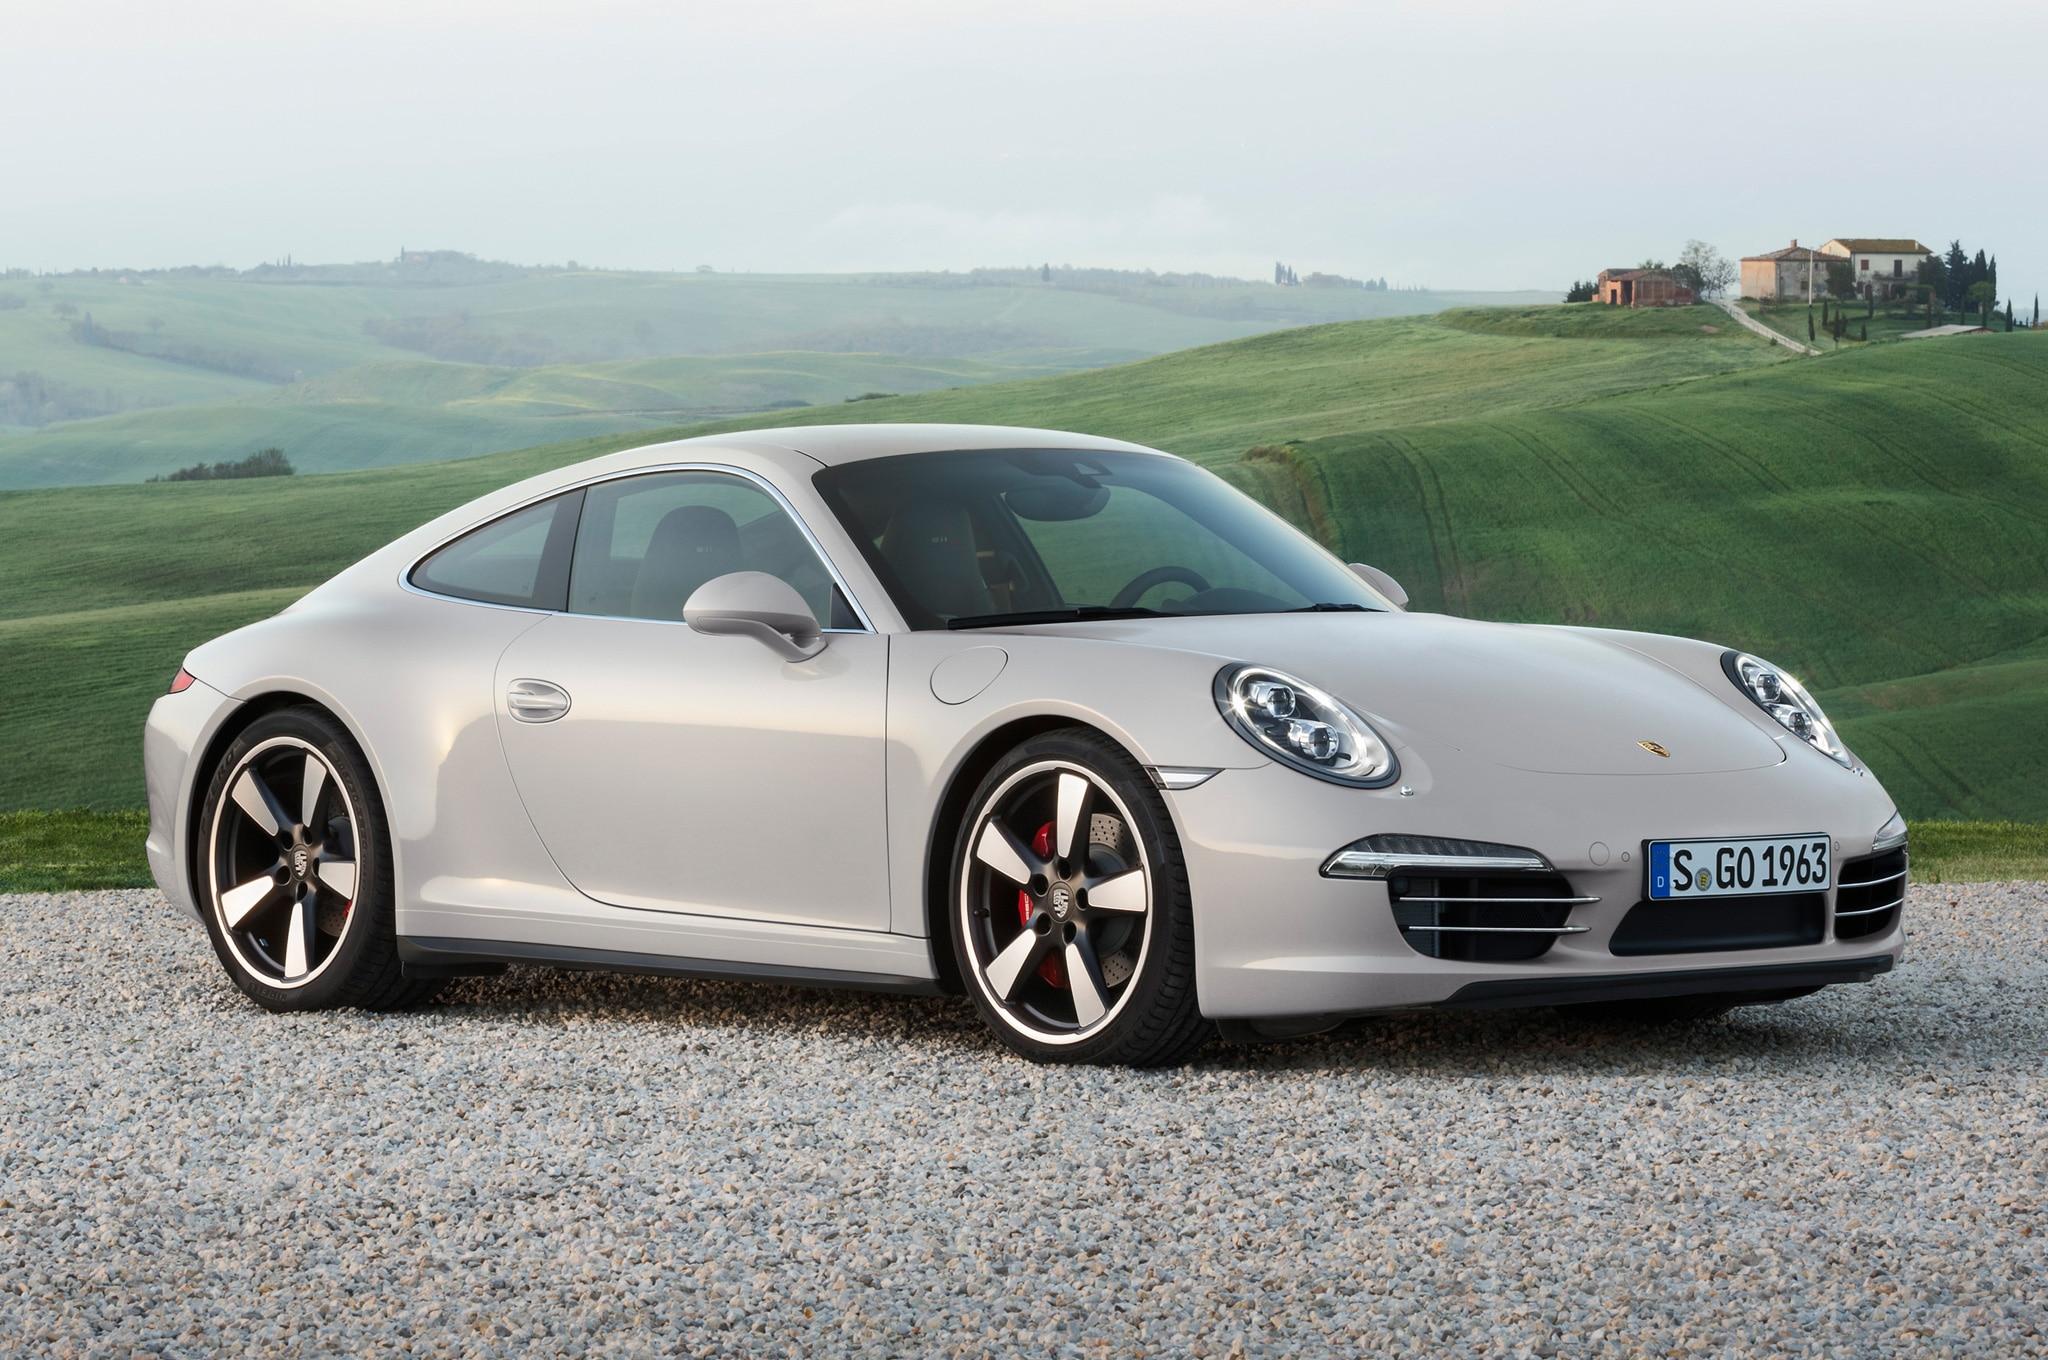 2013 Porsche 911 50th Anniversary Edition Front View1